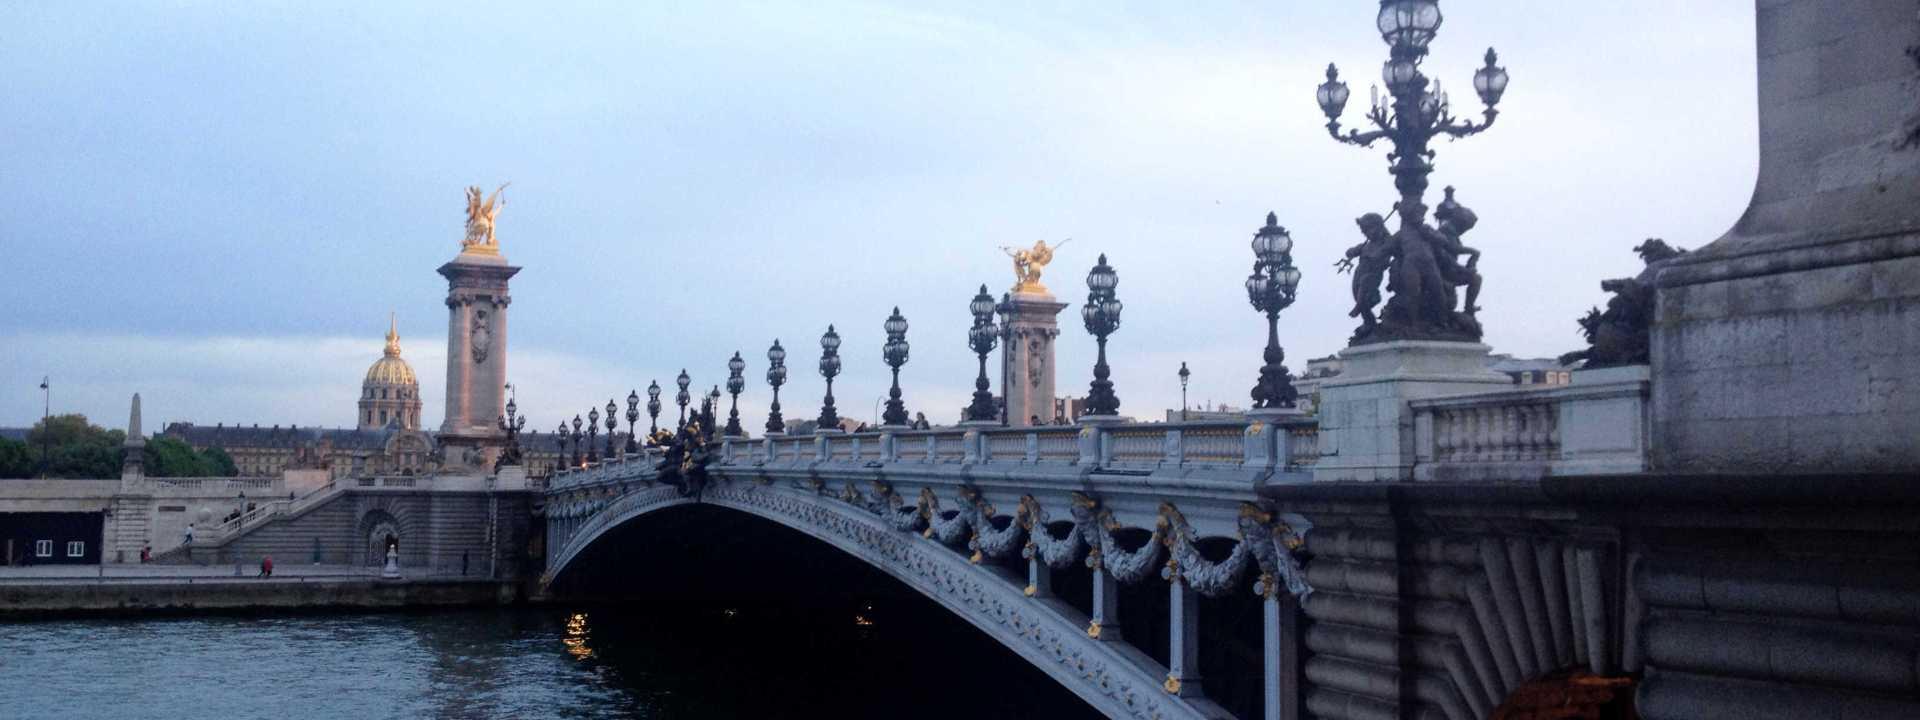 Parigi val bene una messa